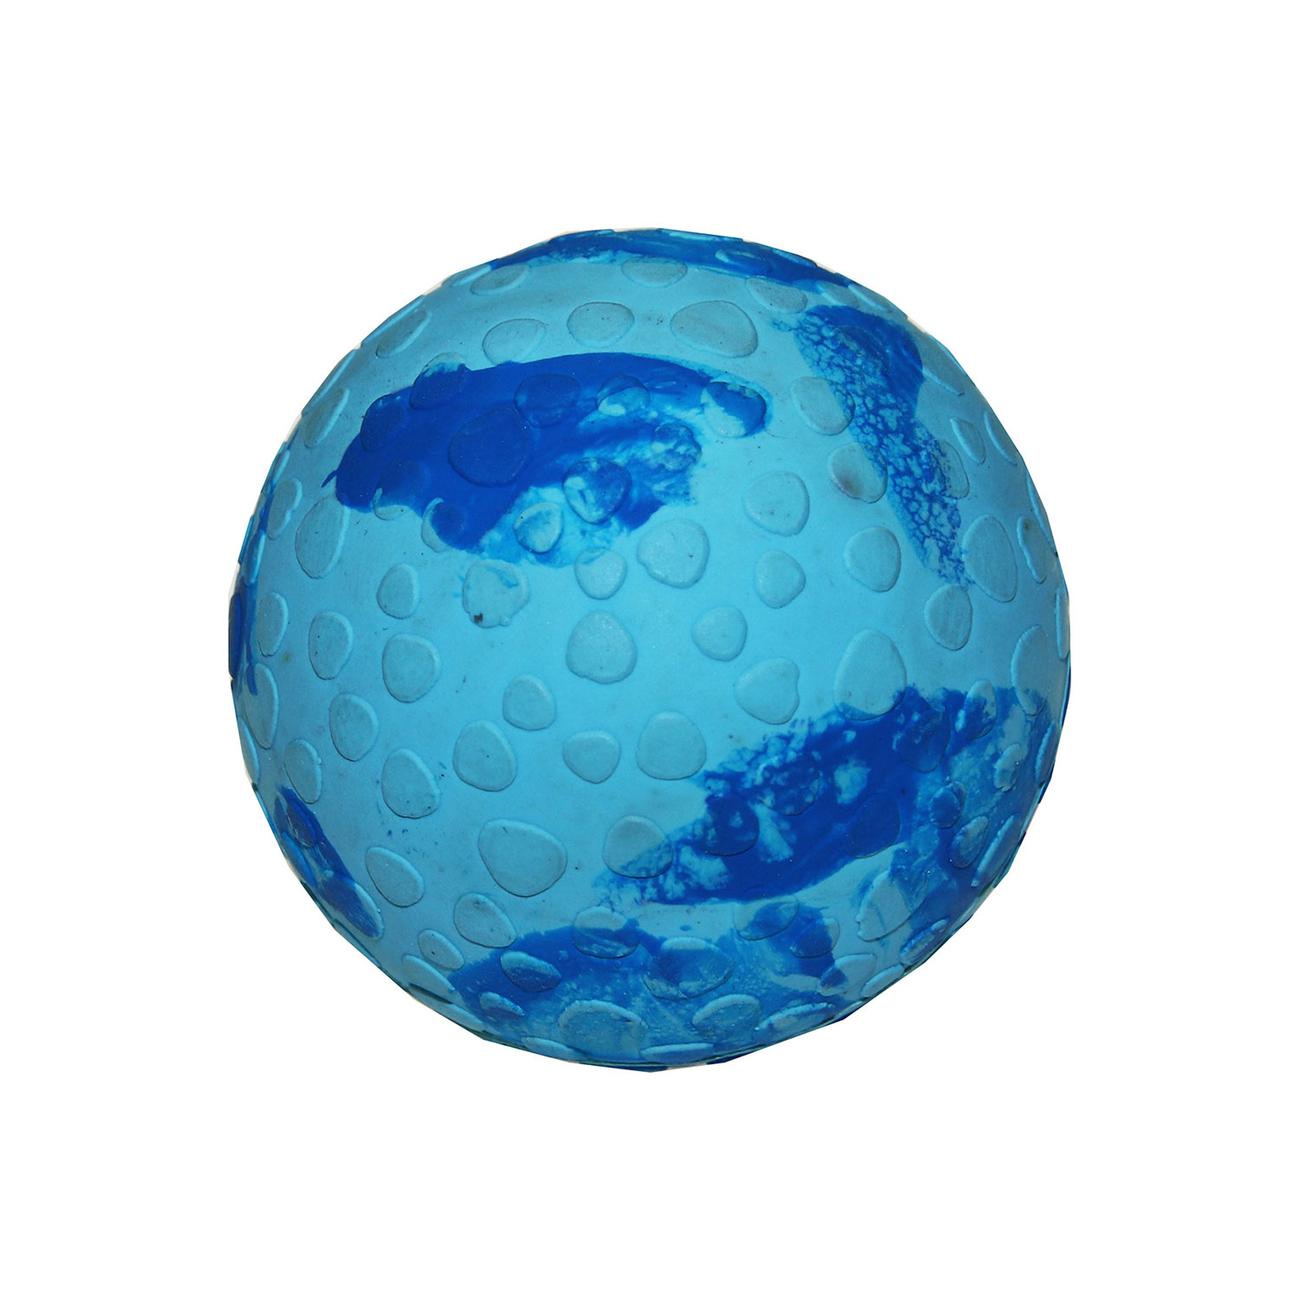 Wolters Aqua-Fun Wasserball Hundespielzeug, Bild 7